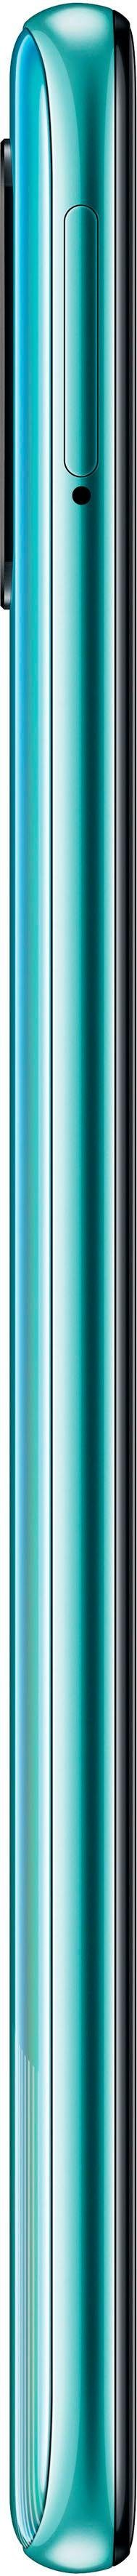 SAMSUNG smartphone Galaxy A51 makkelijk besteld | OTTO